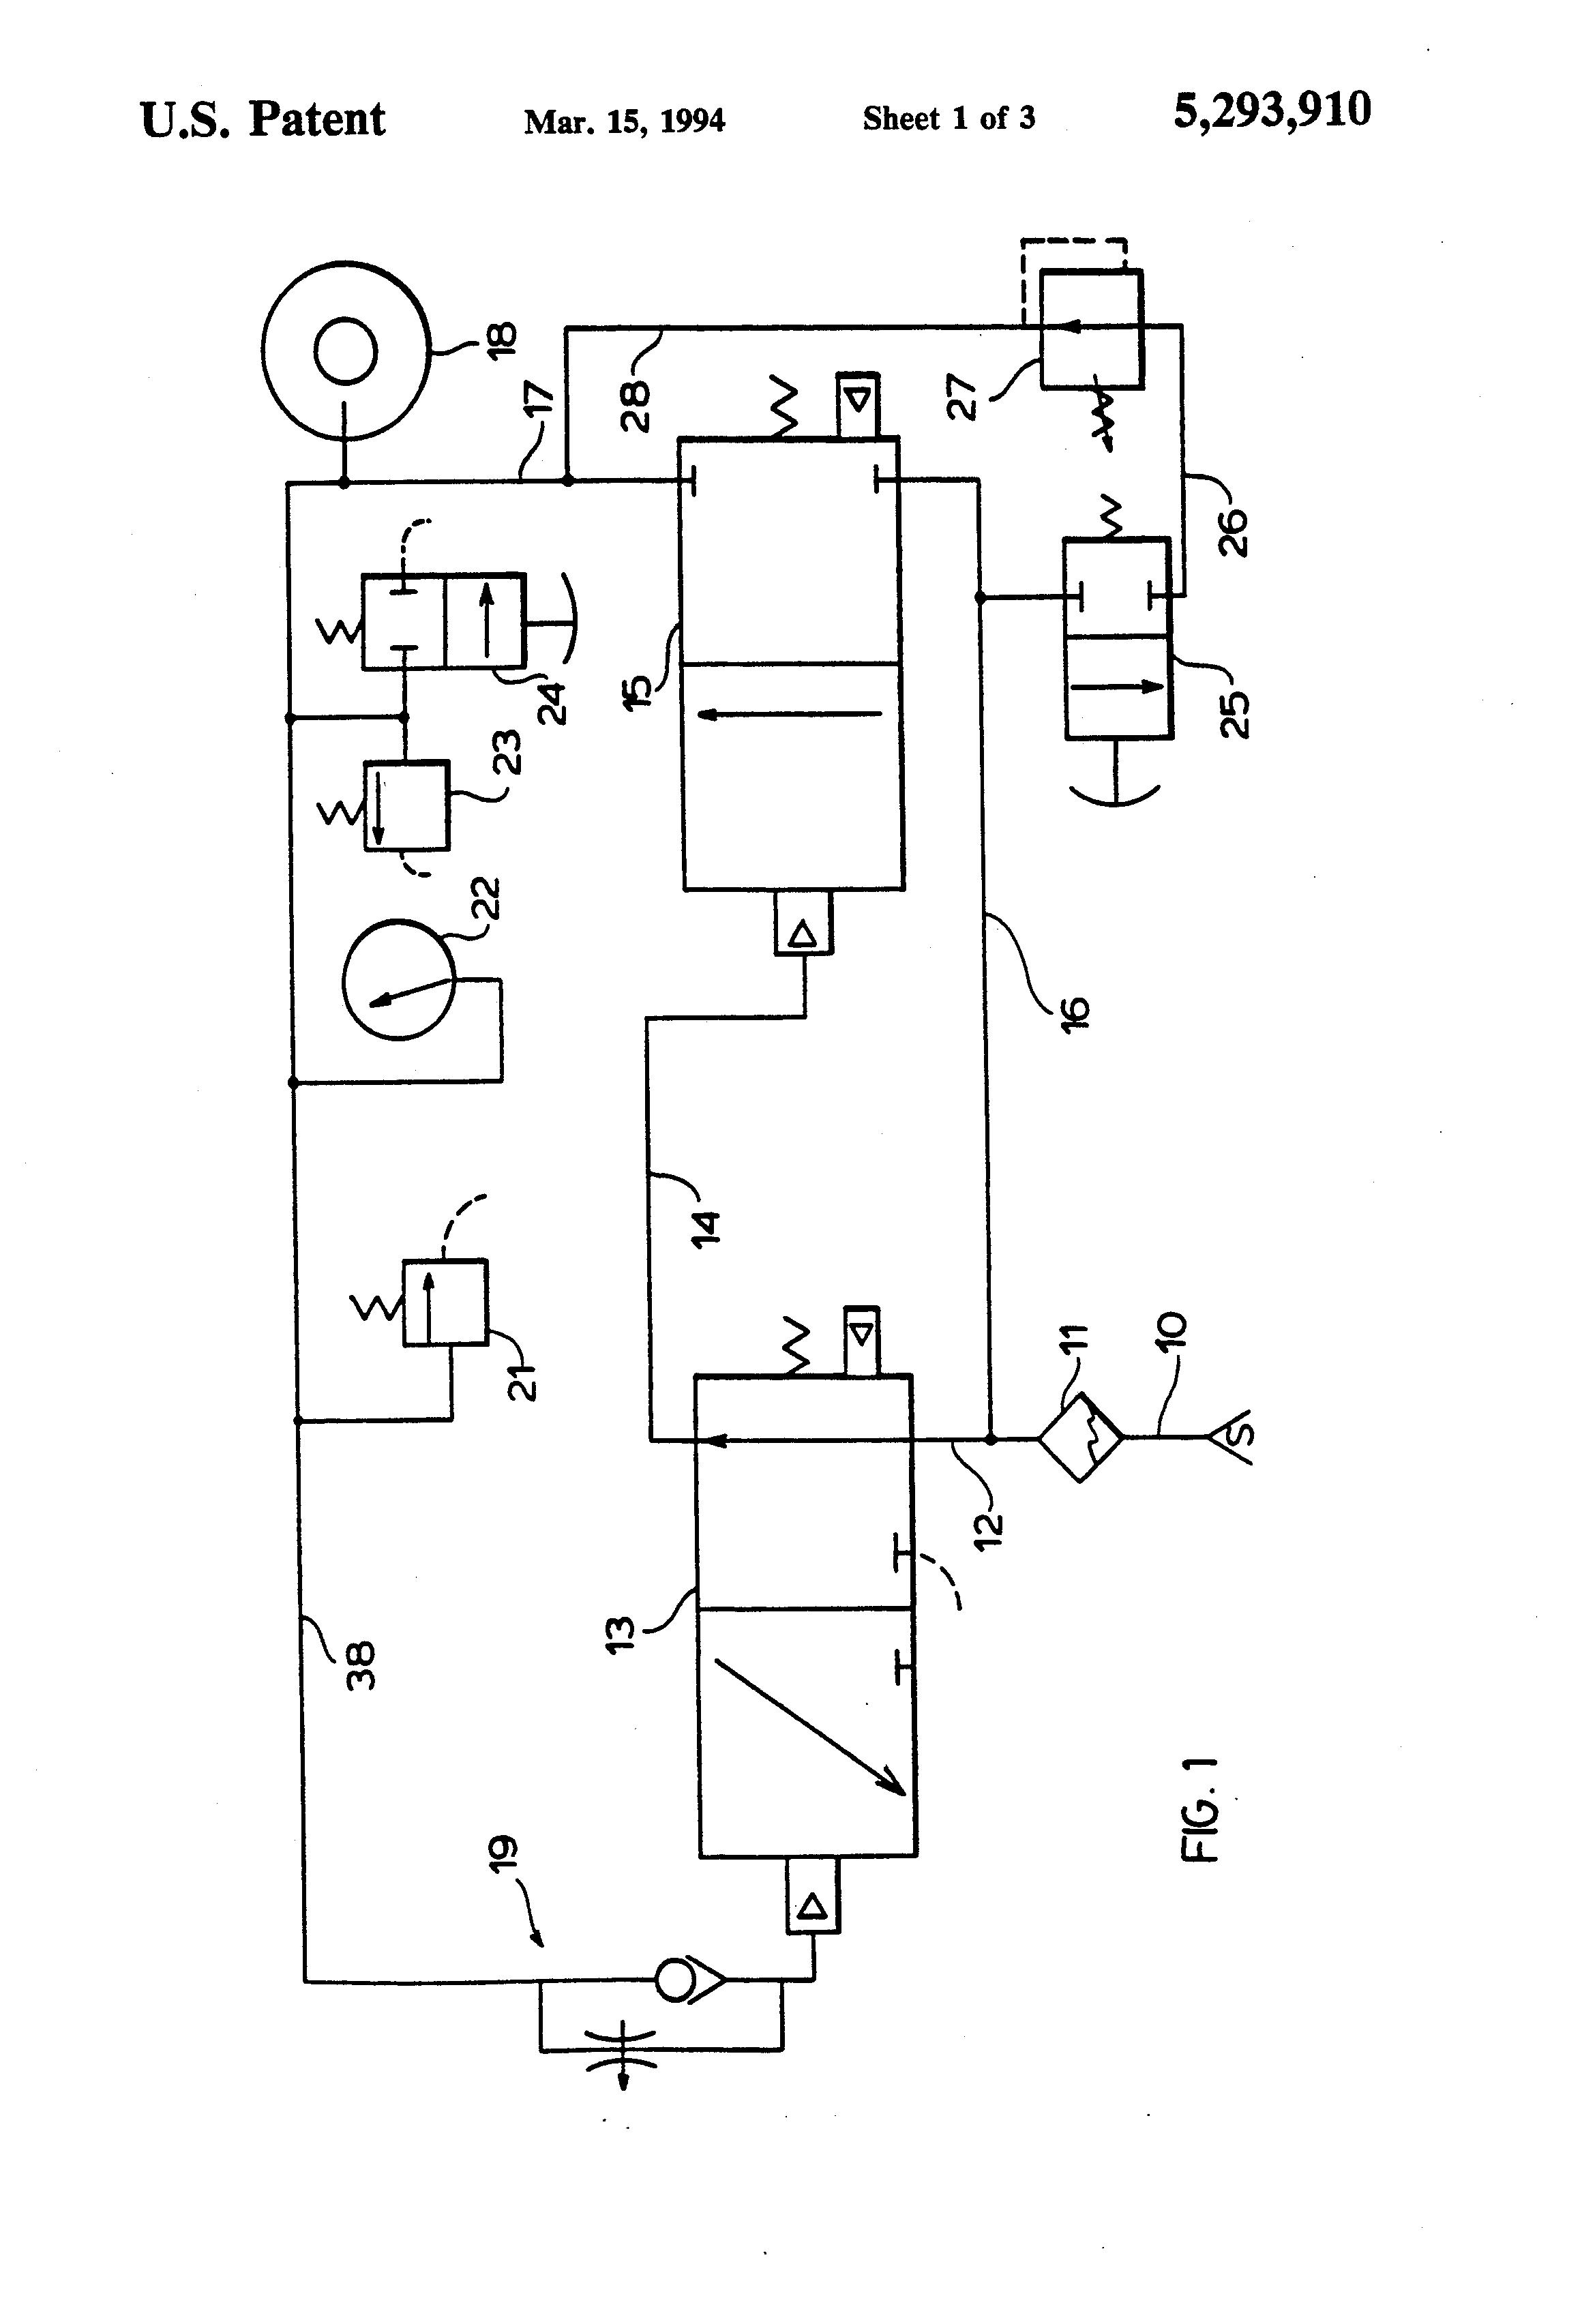 Diagram Symbols Free Electrical Wiring Diagram Pdf Herzenlib Org